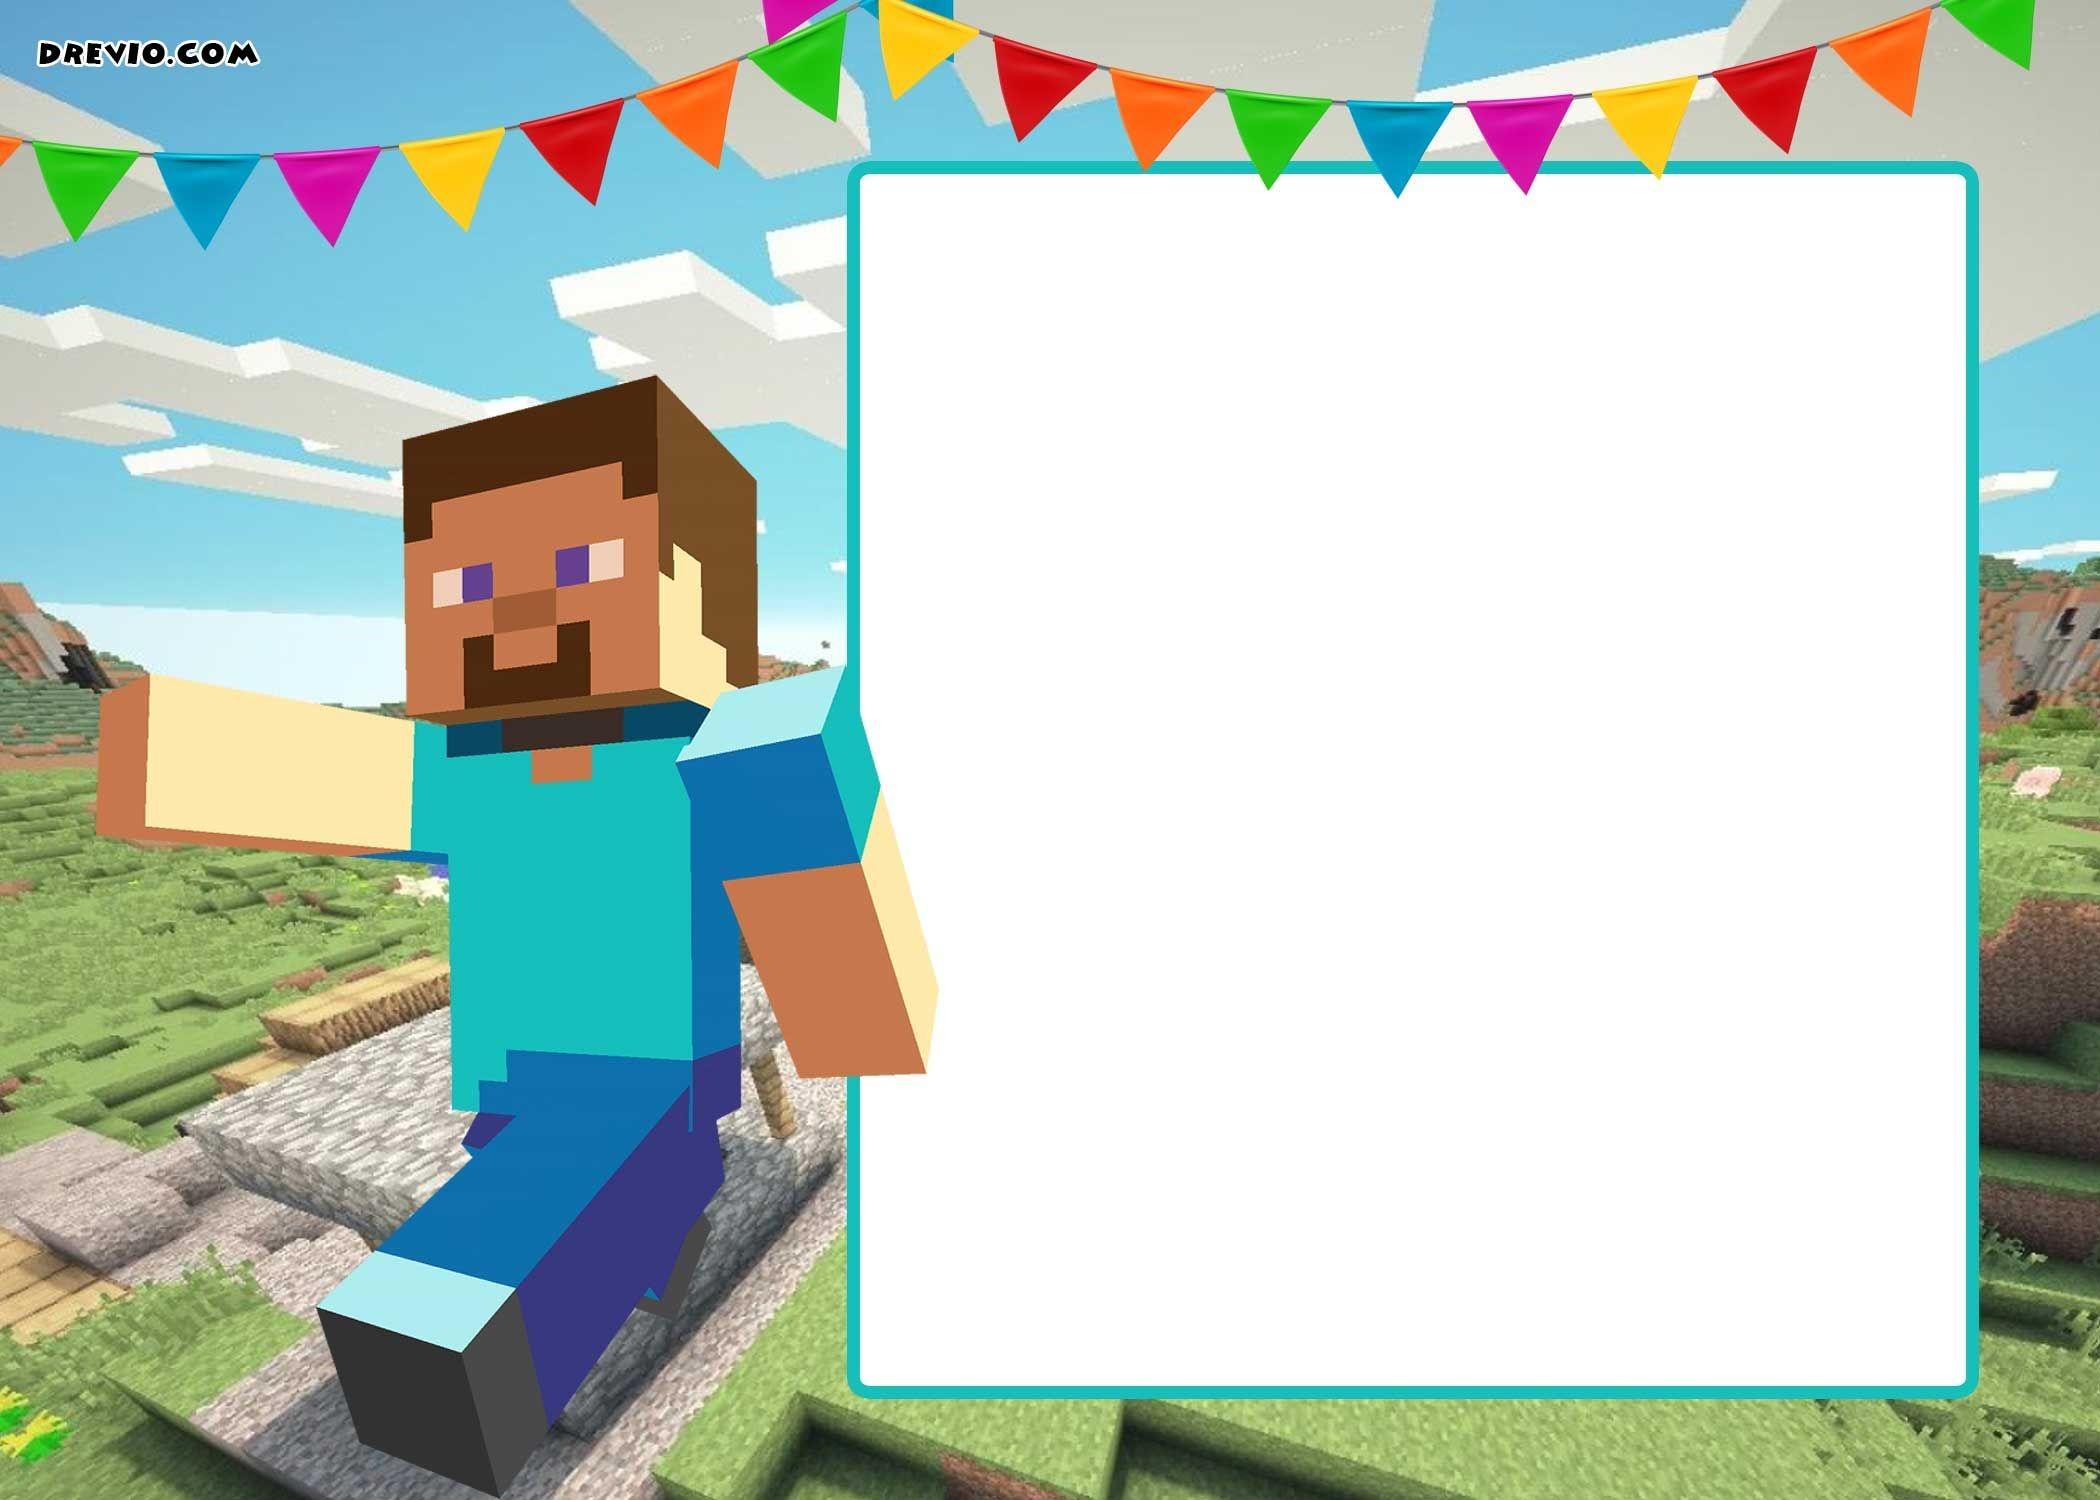 Free Printable Minecraft Birthday Invitation | Party Printables - Free Printable Minecraft Birthday Party Invitations Templates